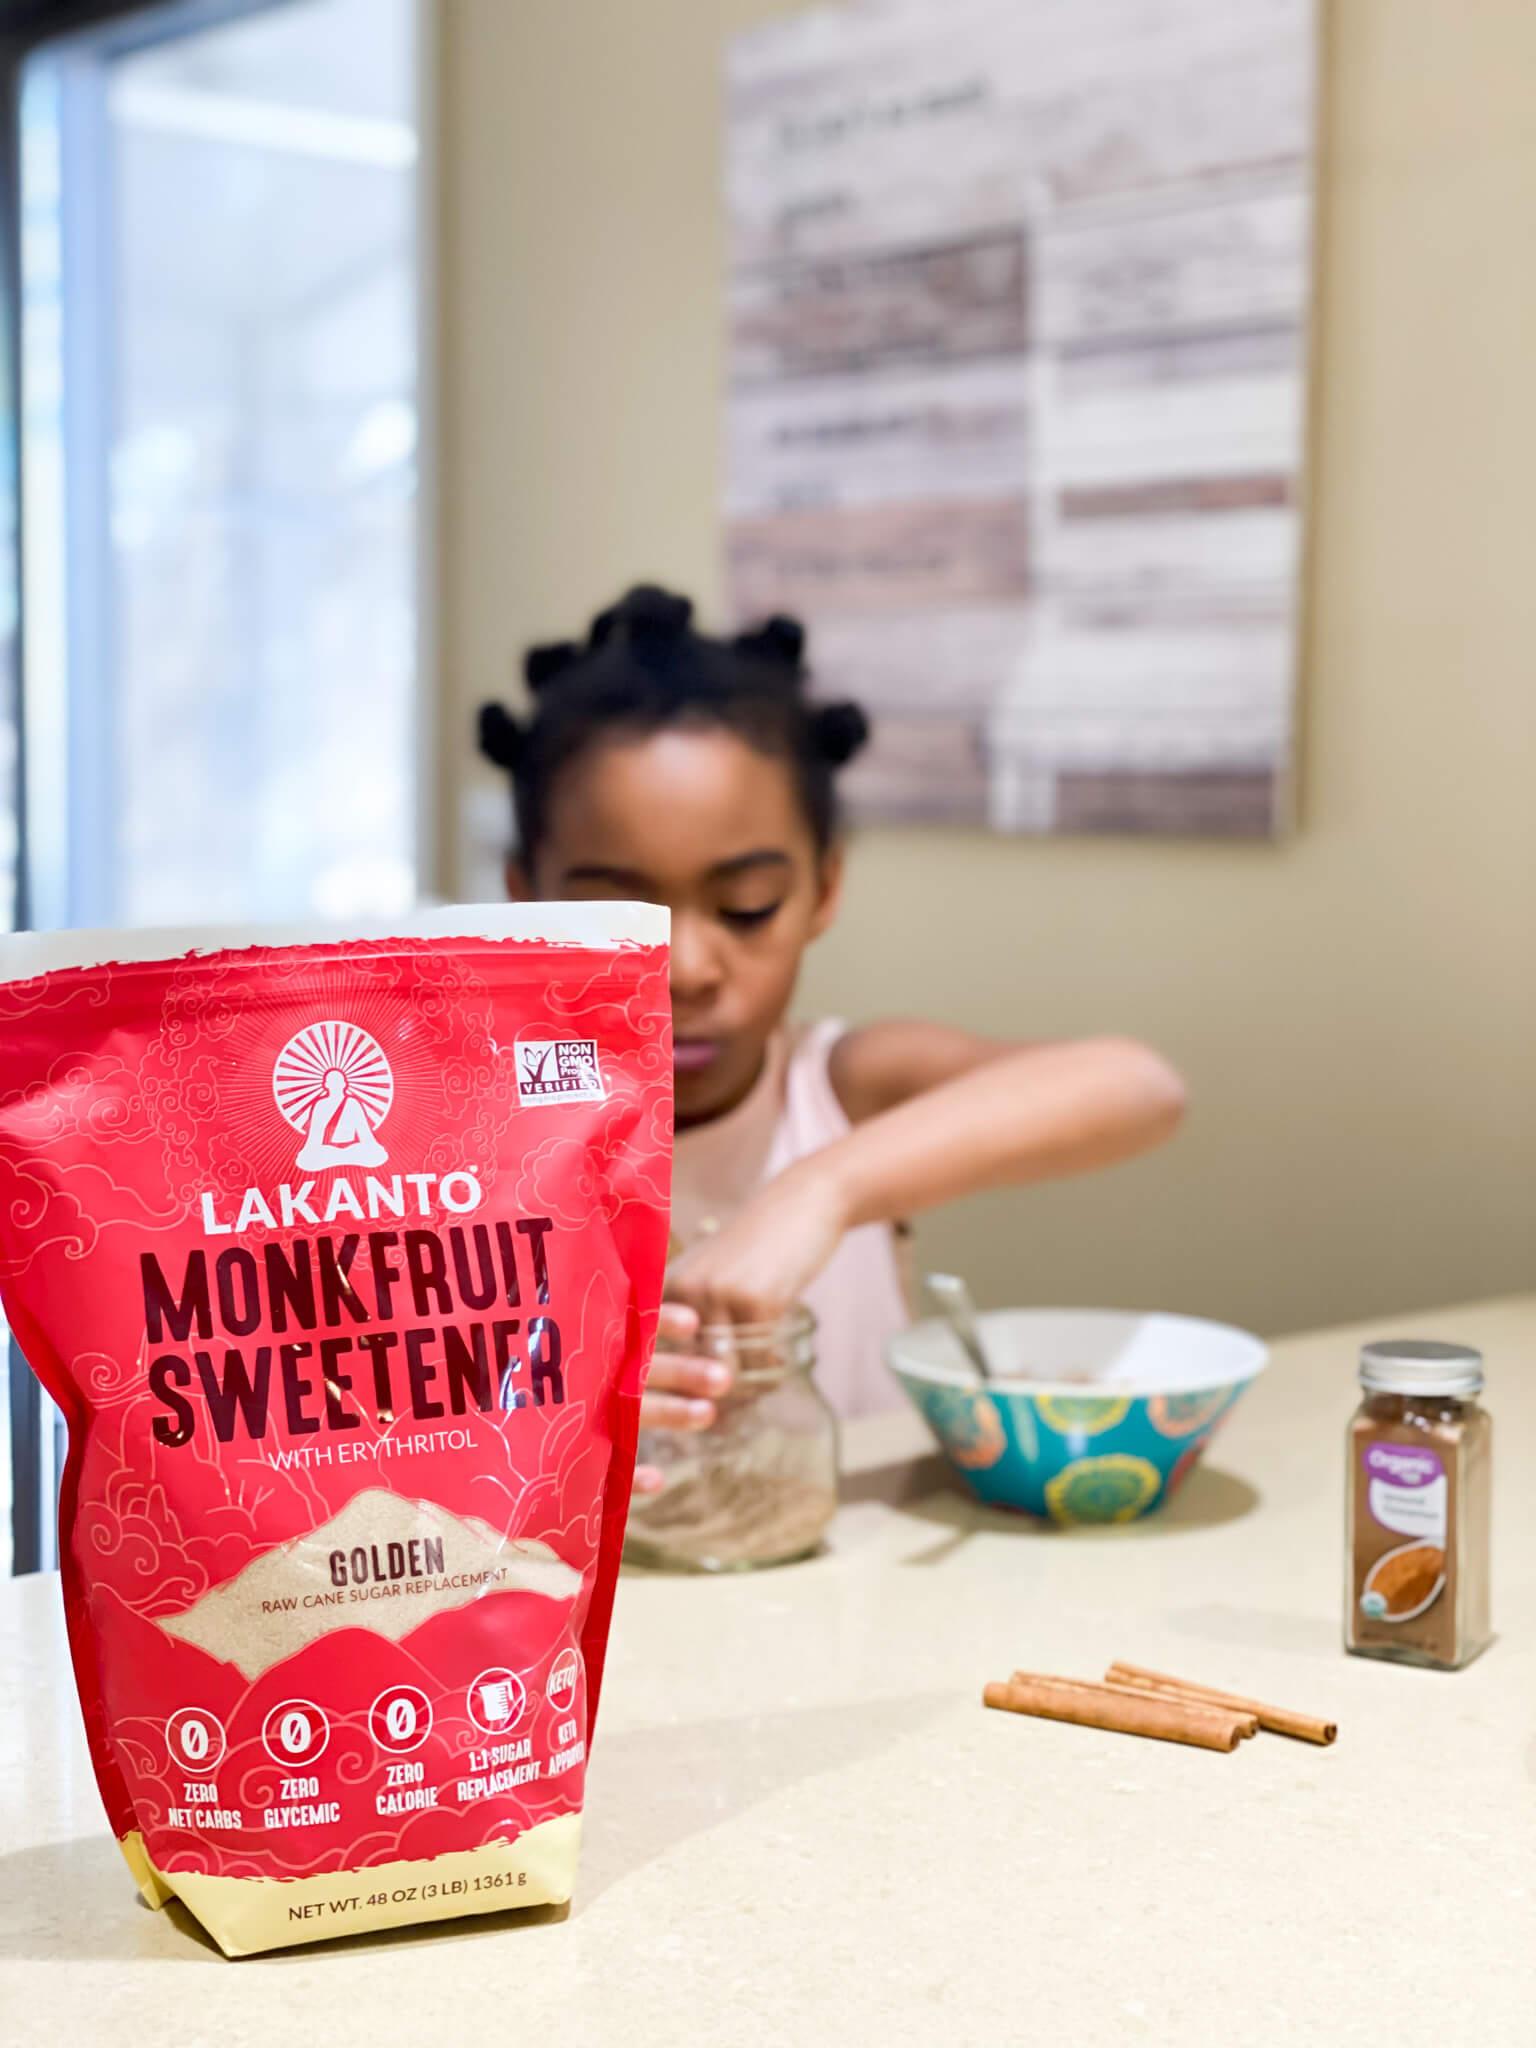 2-Ingredient No Sugar Cinnamon Sugar agutsygirl.com #nosugar #monkfruit #healthyliving #guthealth #cinnamonsugar Lakanto Samarah